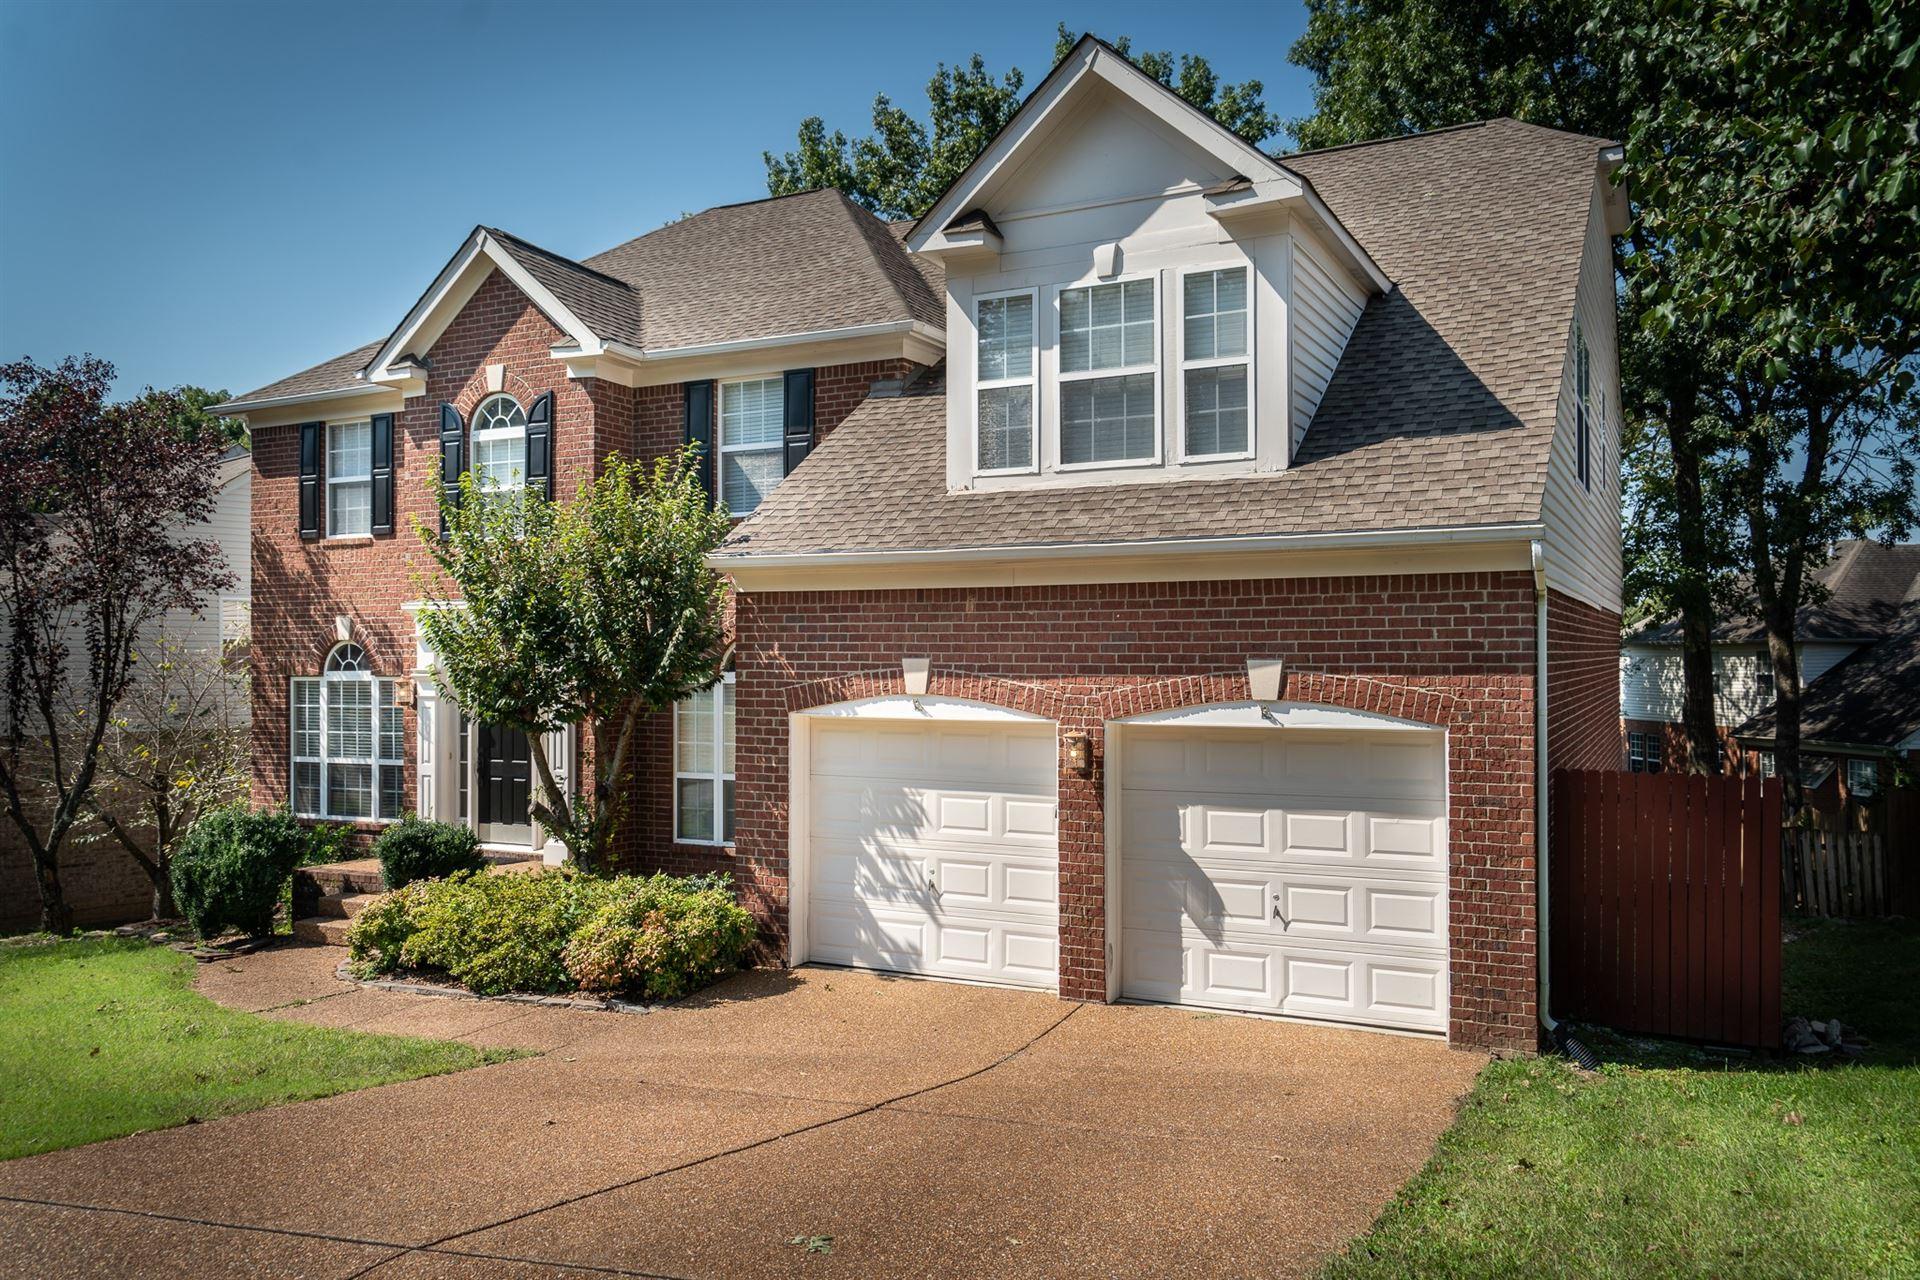 Photo of 804 Holt Grove Ct, Nashville, TN 37211 (MLS # 2303490)